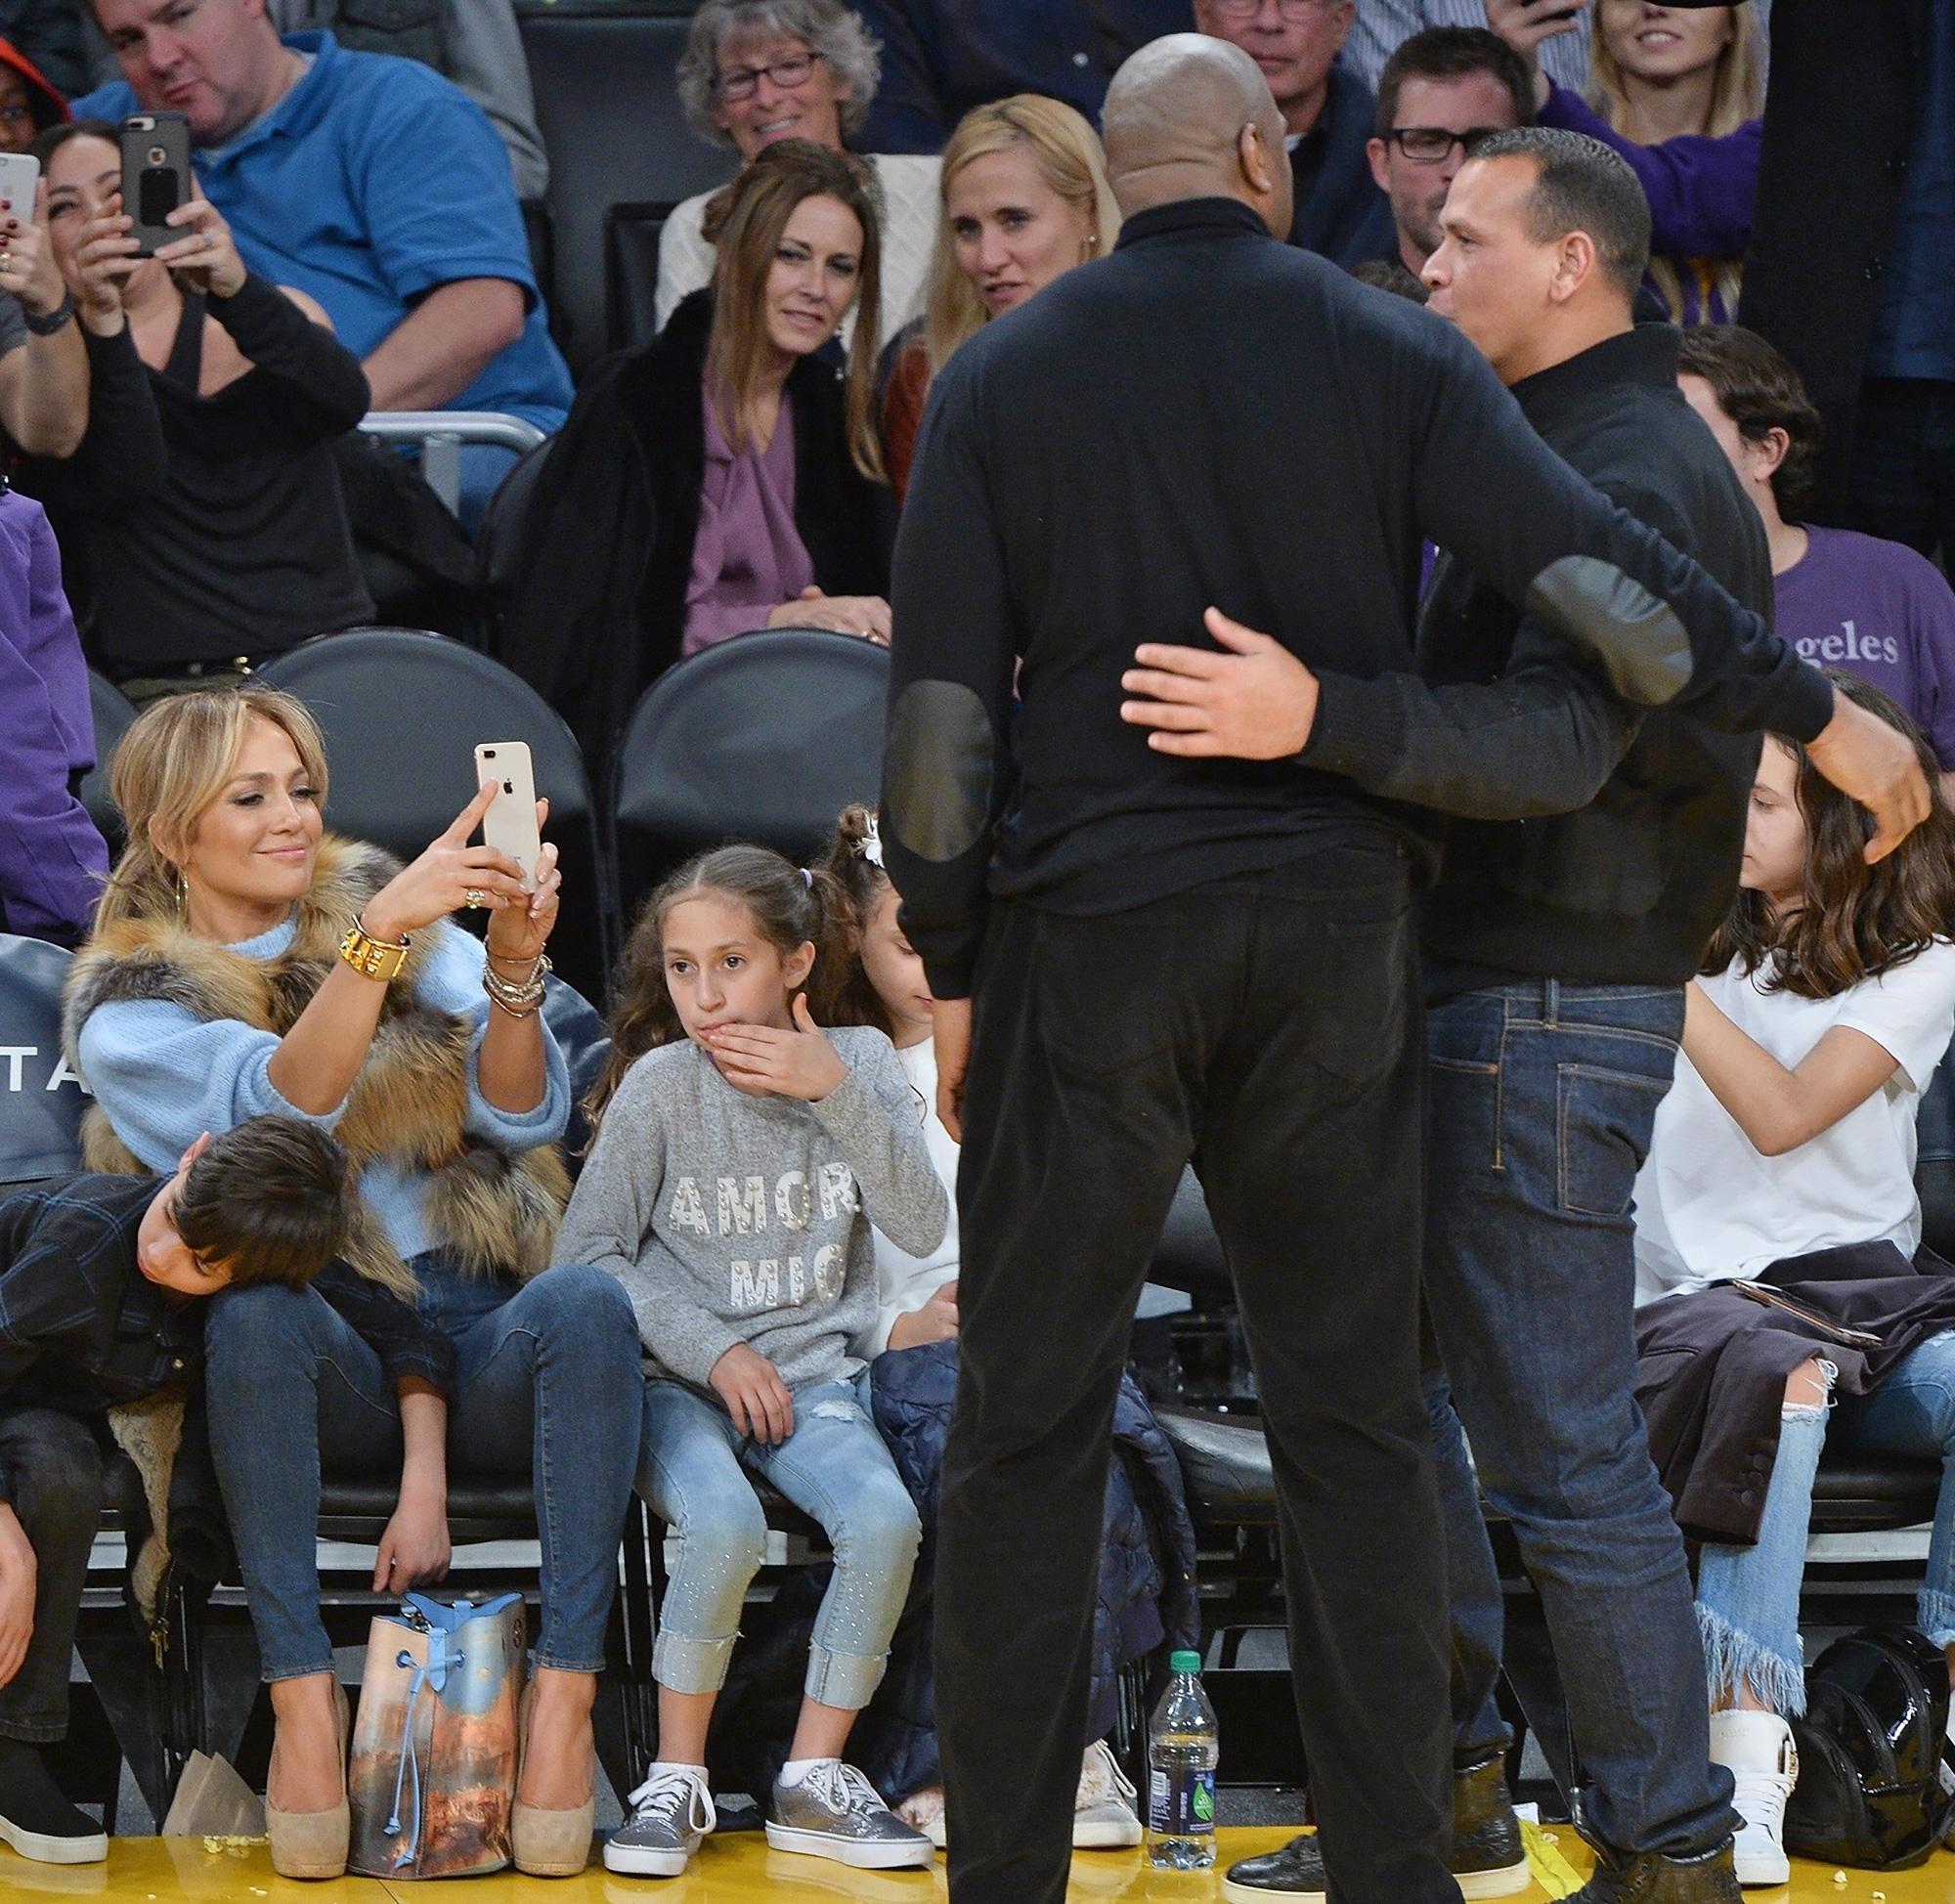 Jennifer Lopez, Alex Rodriguez Bring Kids on Date Night at Lakers Game